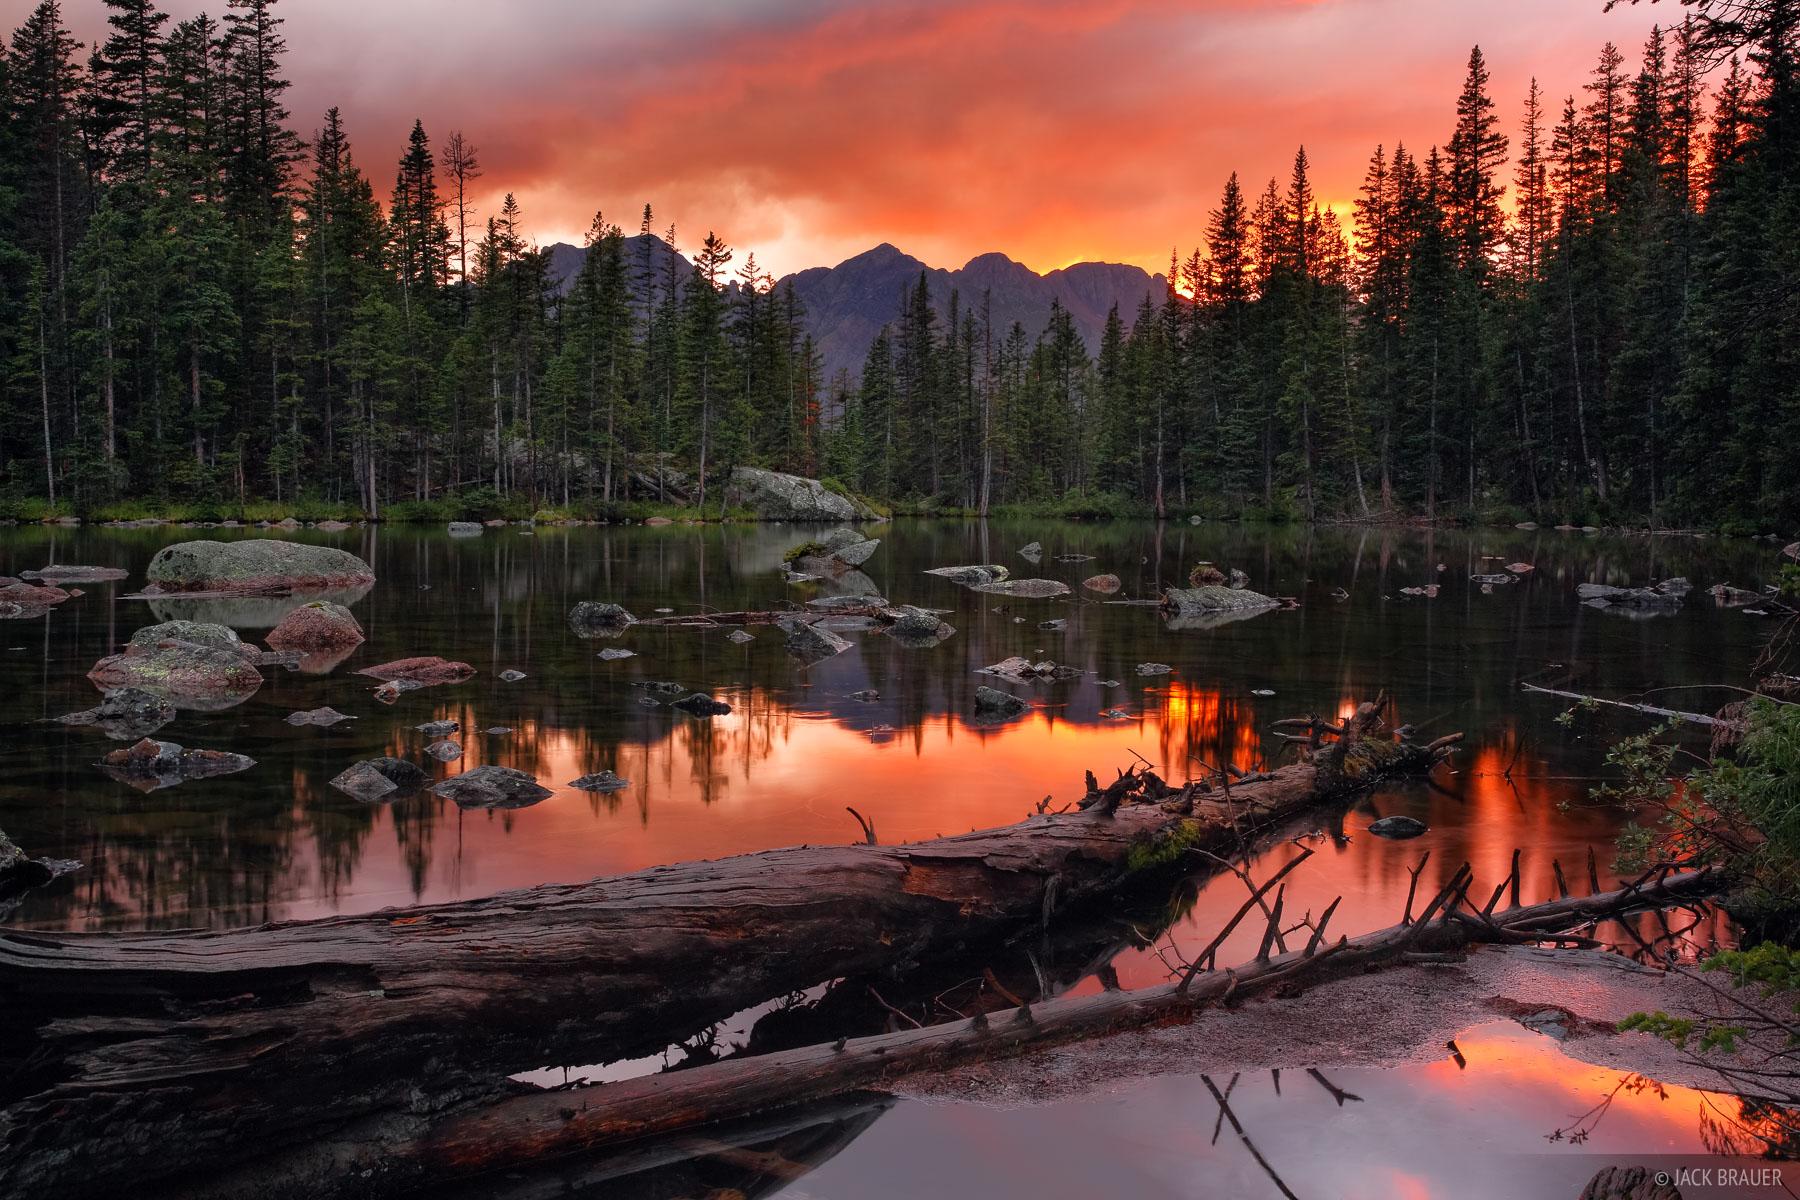 sunset west needle mountains colorado san juan mountains photo